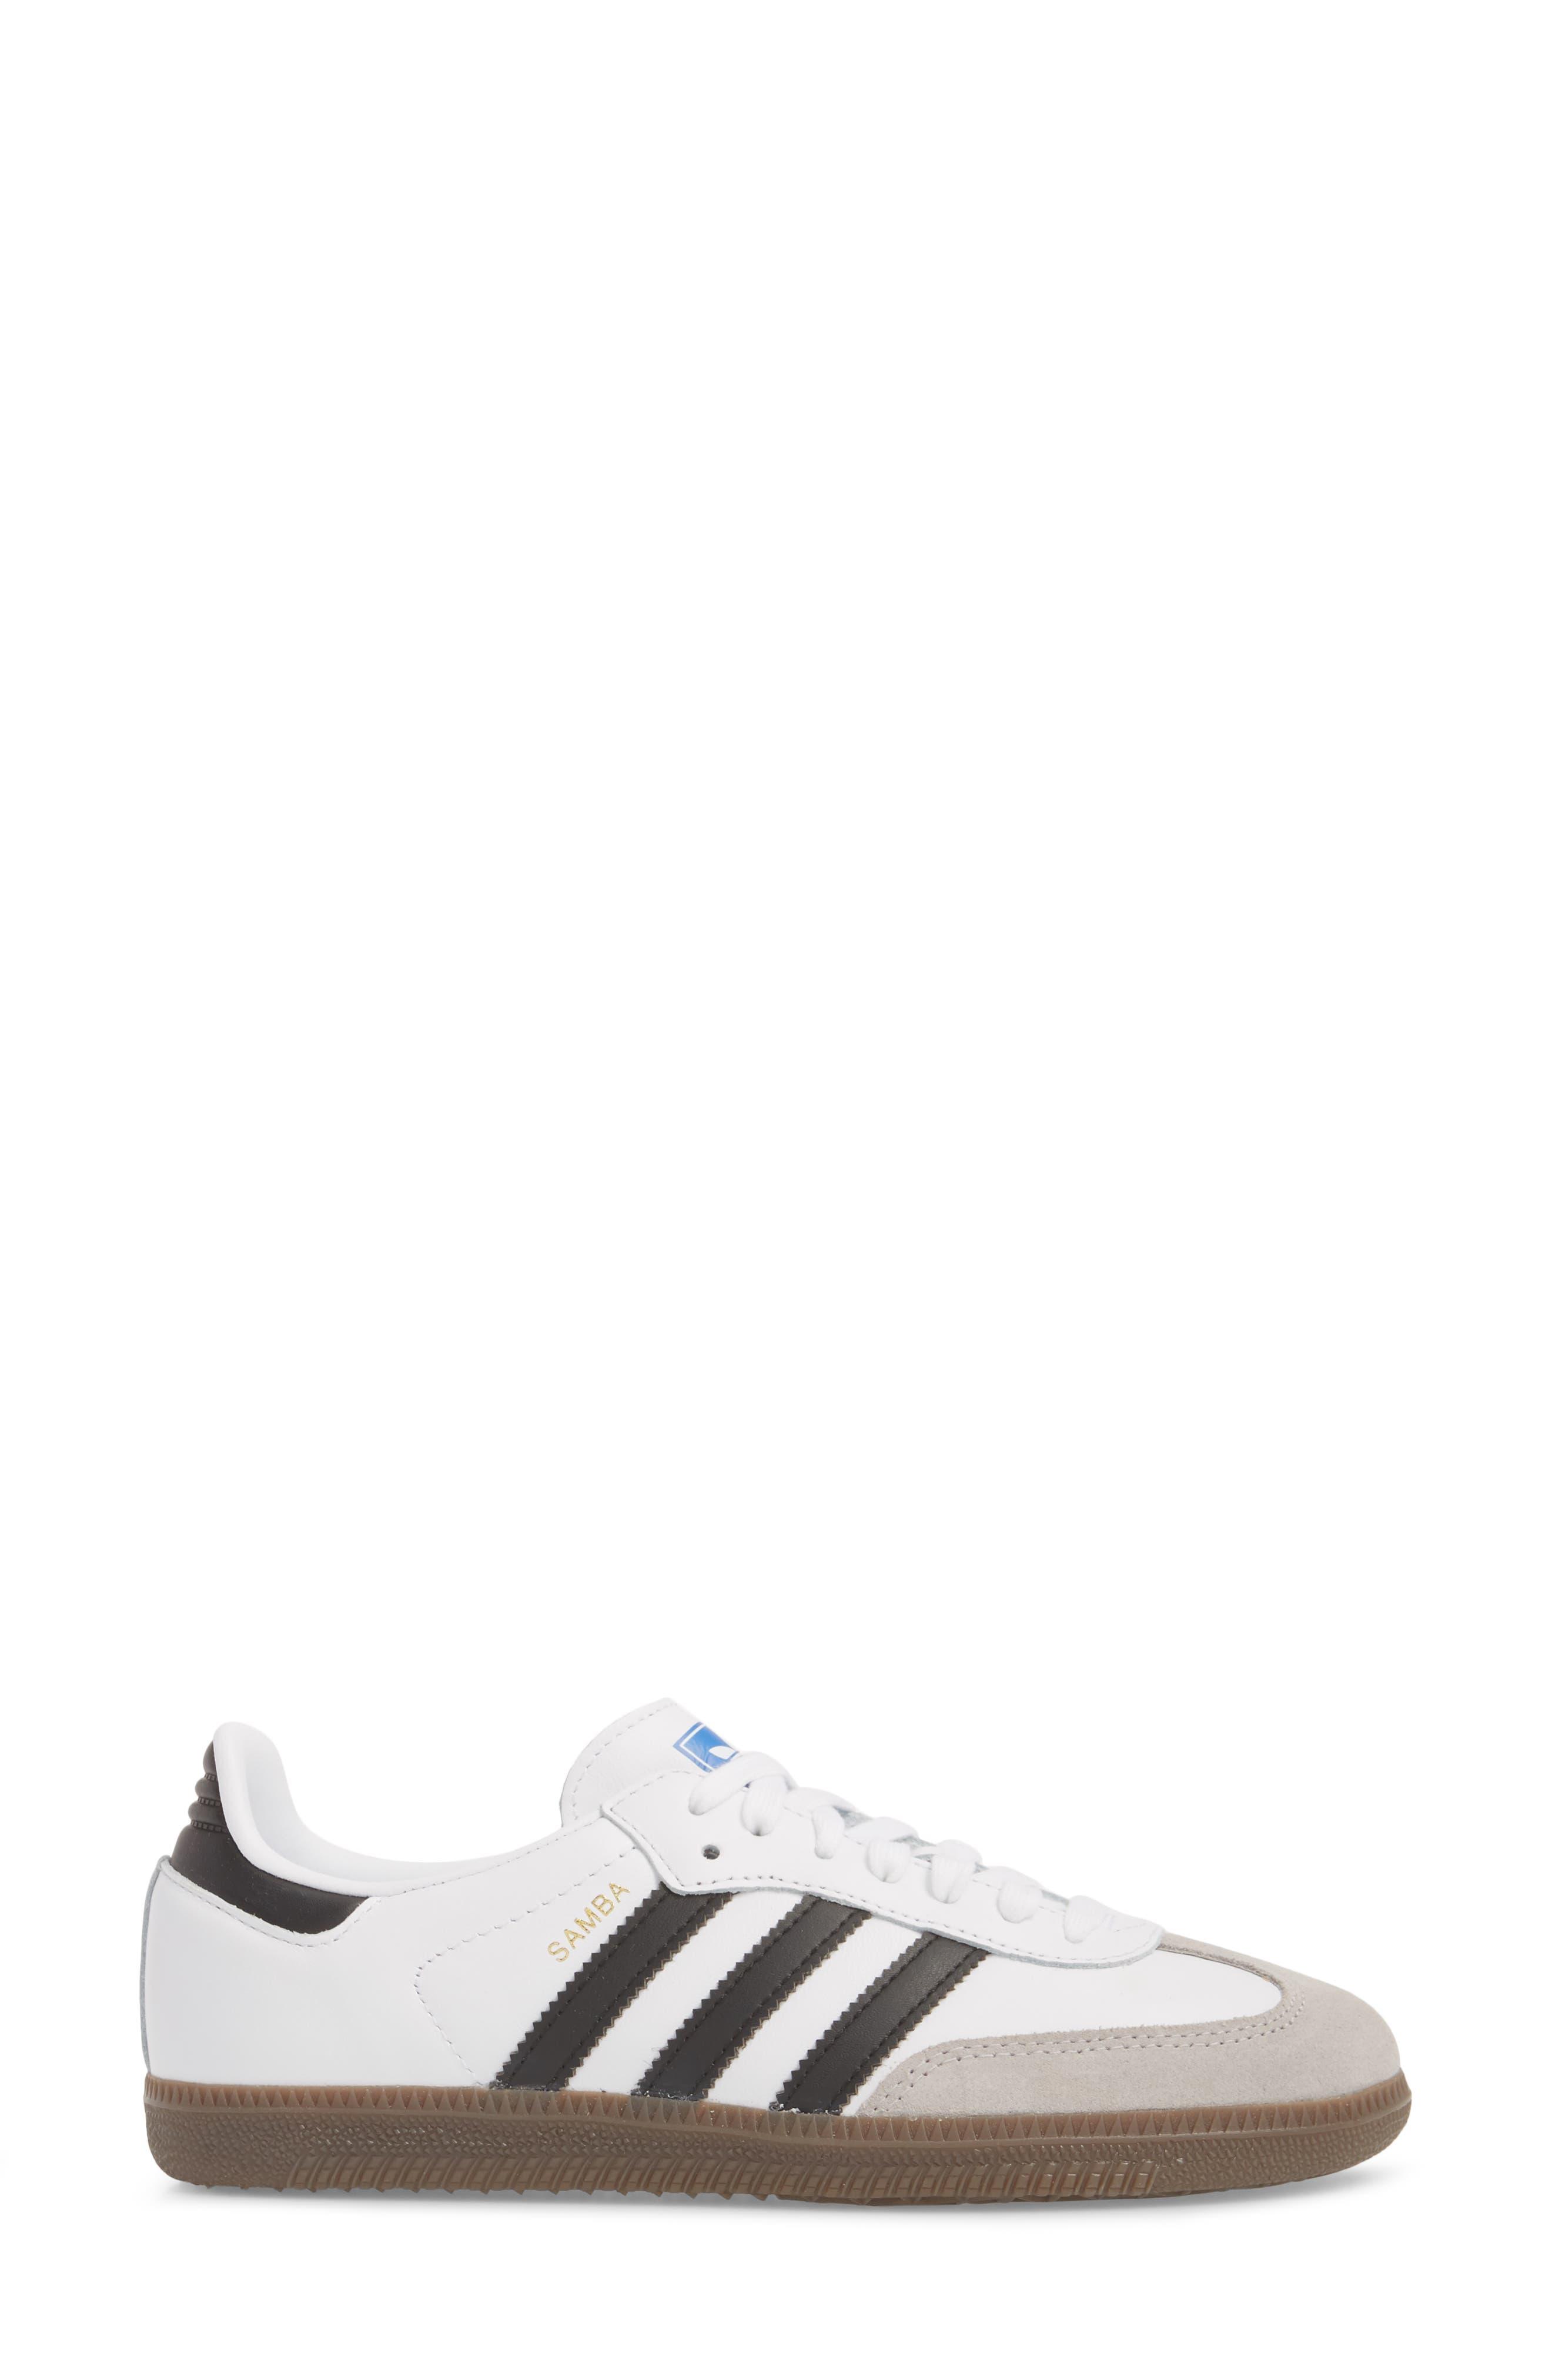 'Samba' Sneaker,                             Alternate thumbnail 3, color,                             White/ Black/ Clear Granite